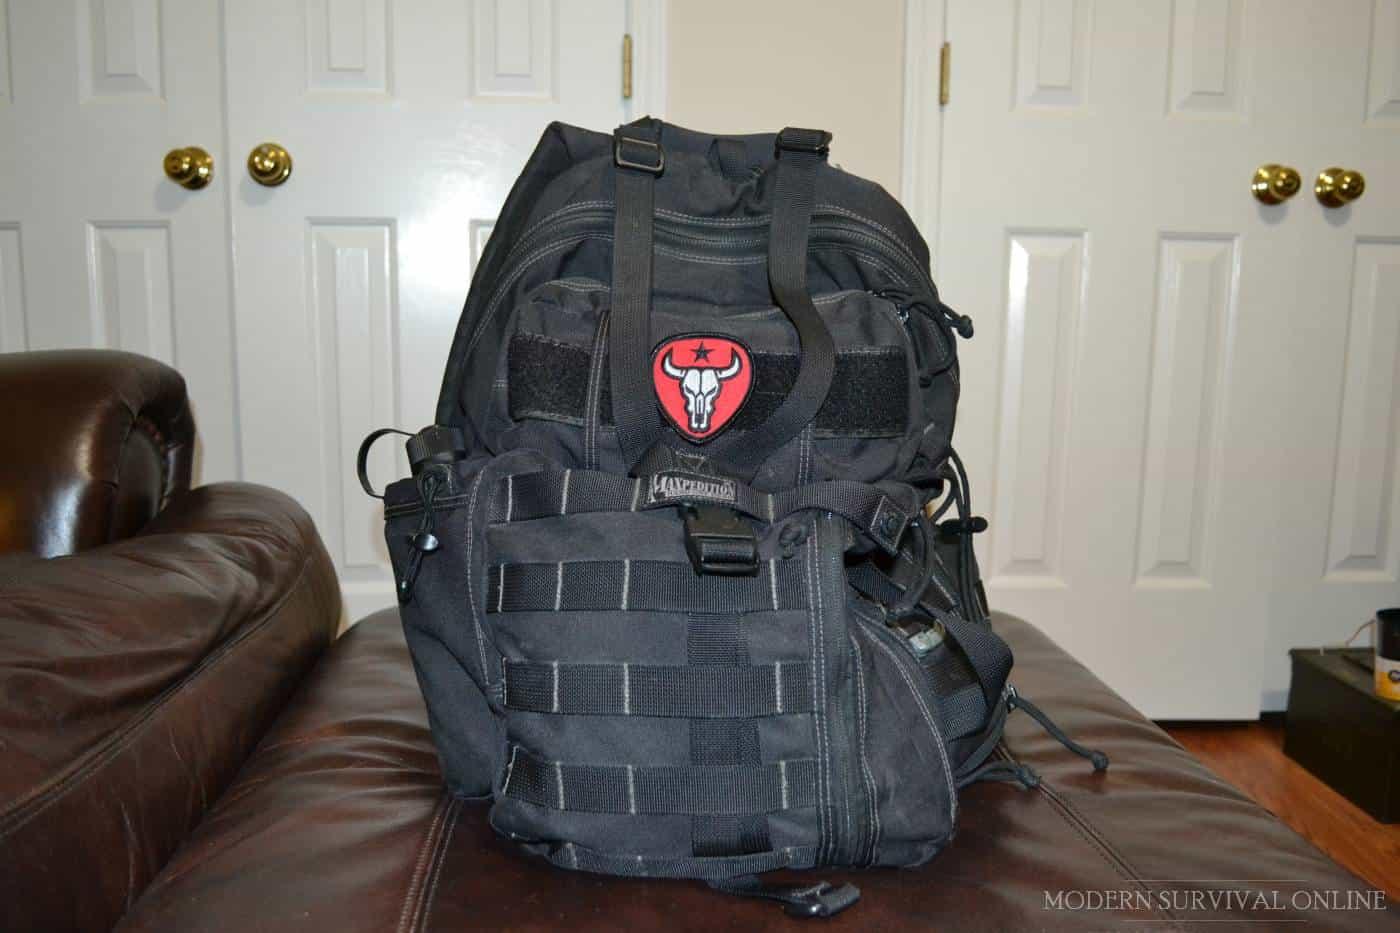 typical get home bag backpack